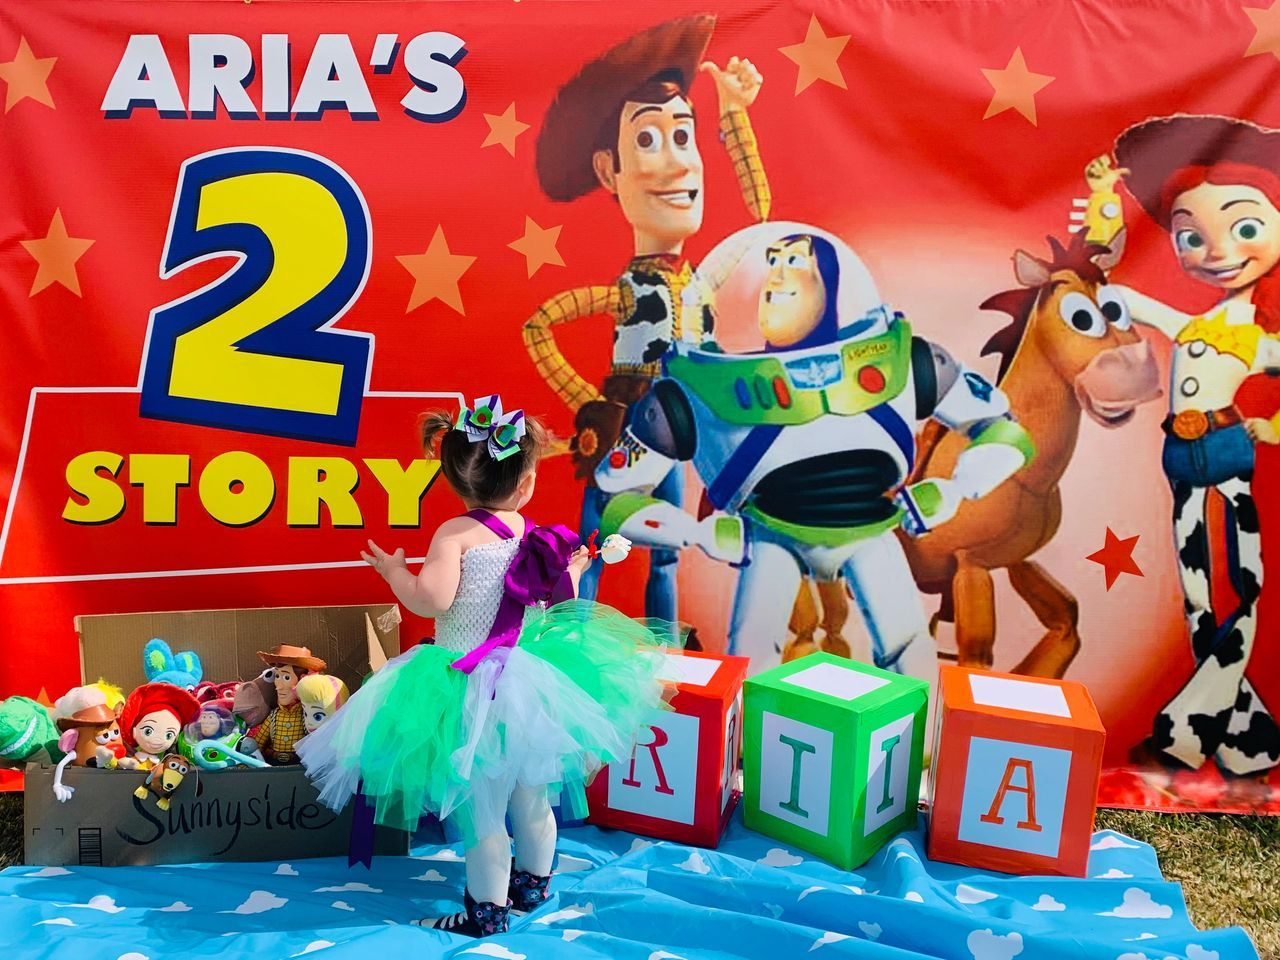 Toy Story Birthday Party Ideas In 2020 Disney Mom Toy Story Birthday Party Disney Blog